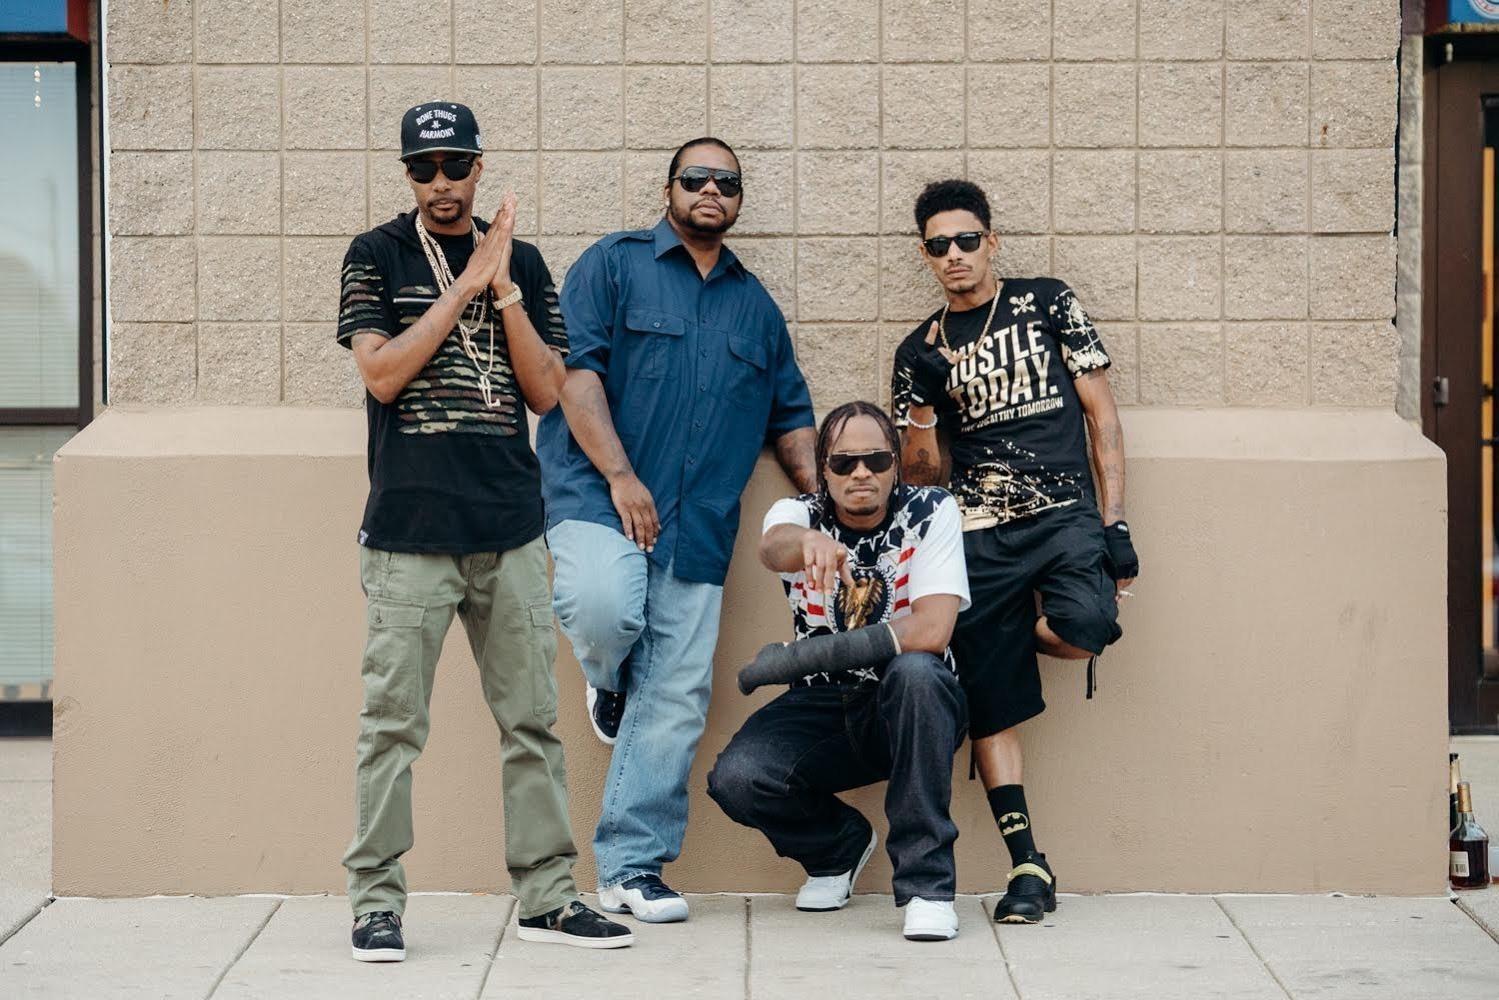 Bone Thugs-N-Harmony with MH The Verb (DJ Set)